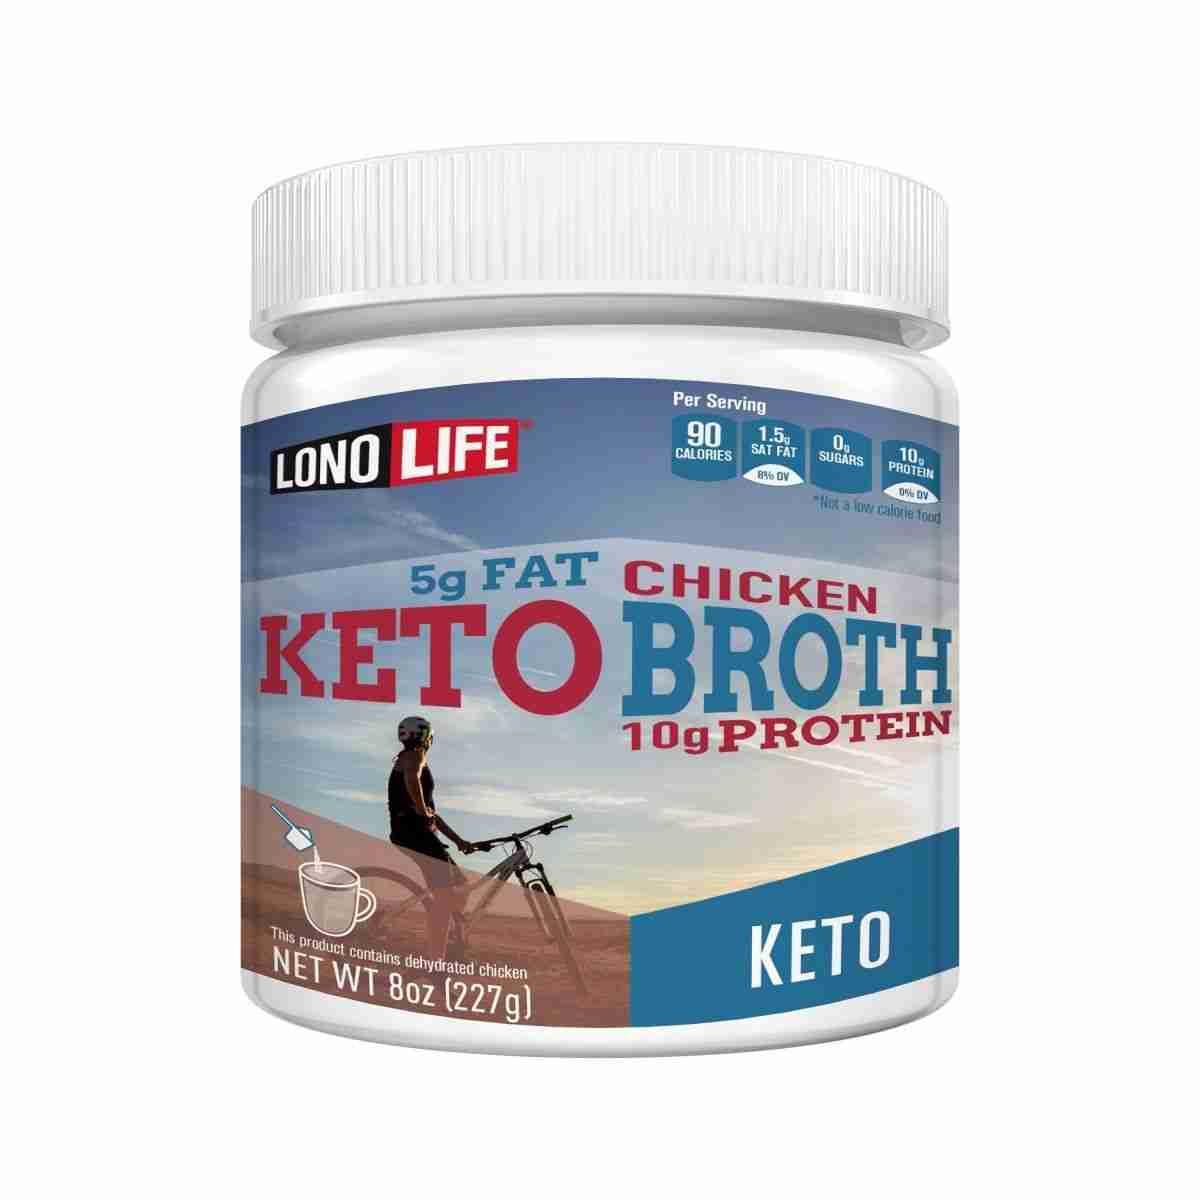 Keto Chicken Bone Broth Bulk Container – 4 Containers